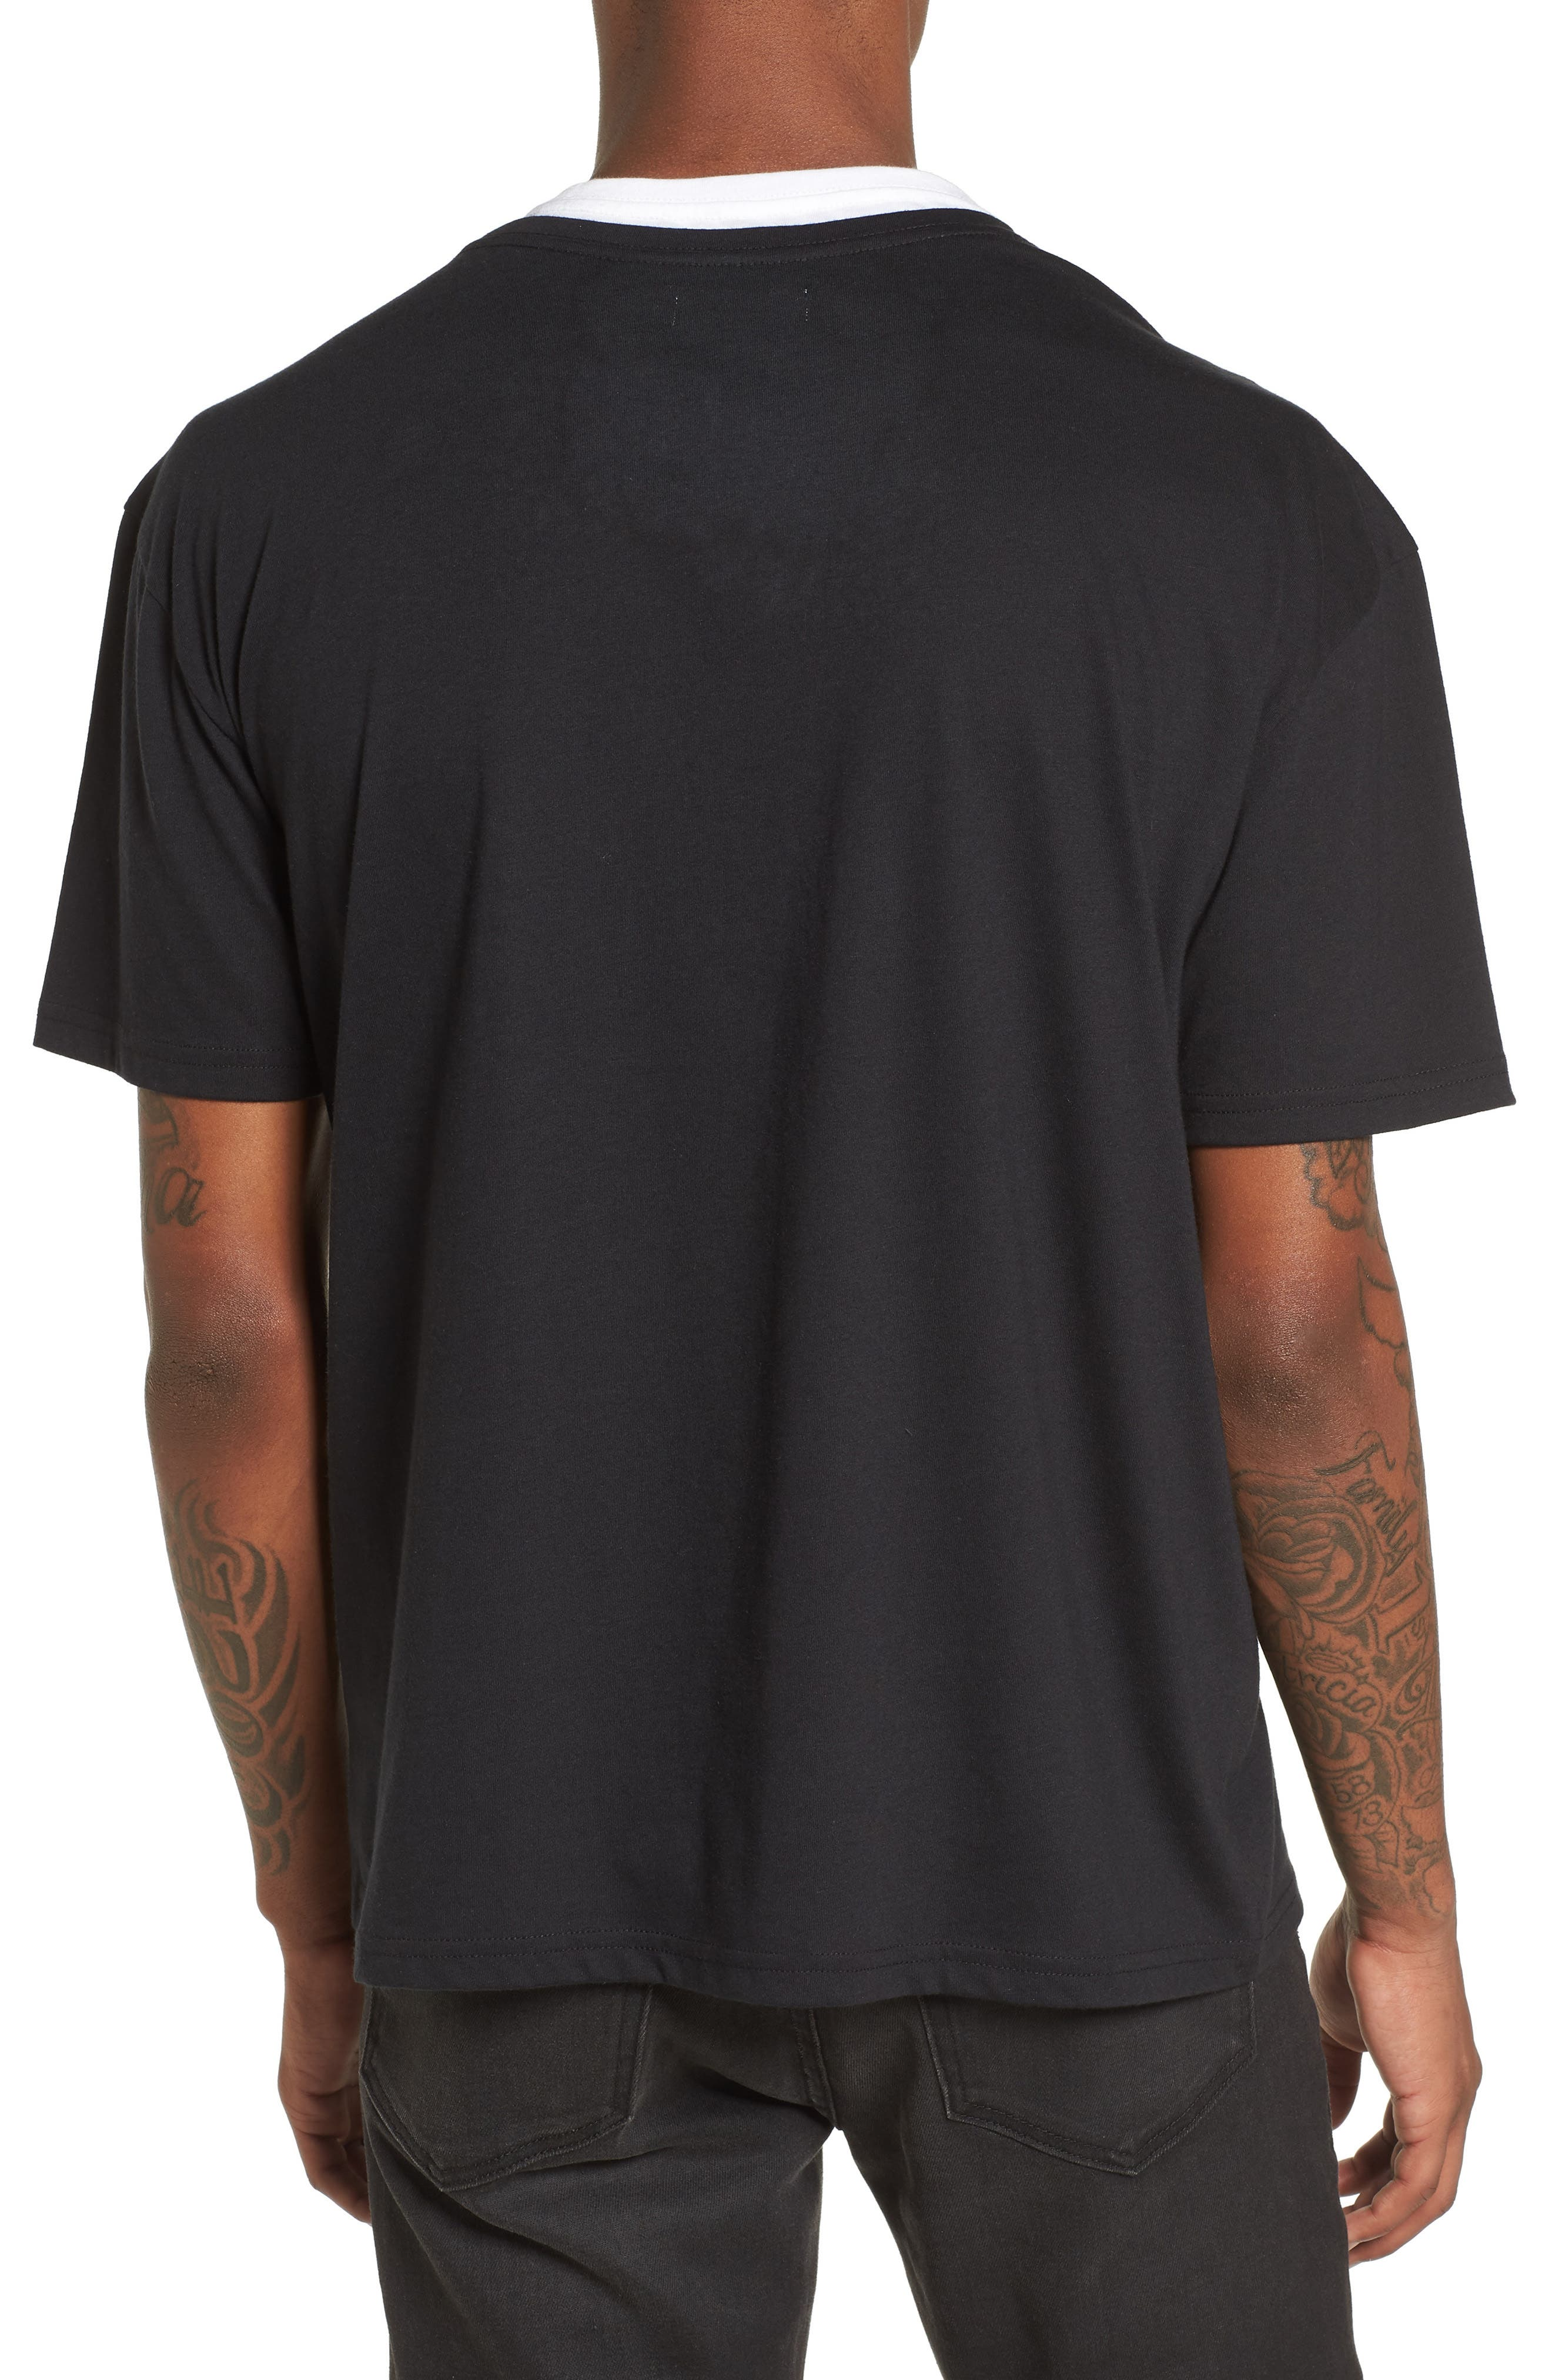 Double Layer T-Shirt,                             Alternate thumbnail 2, color,                             Black/ White